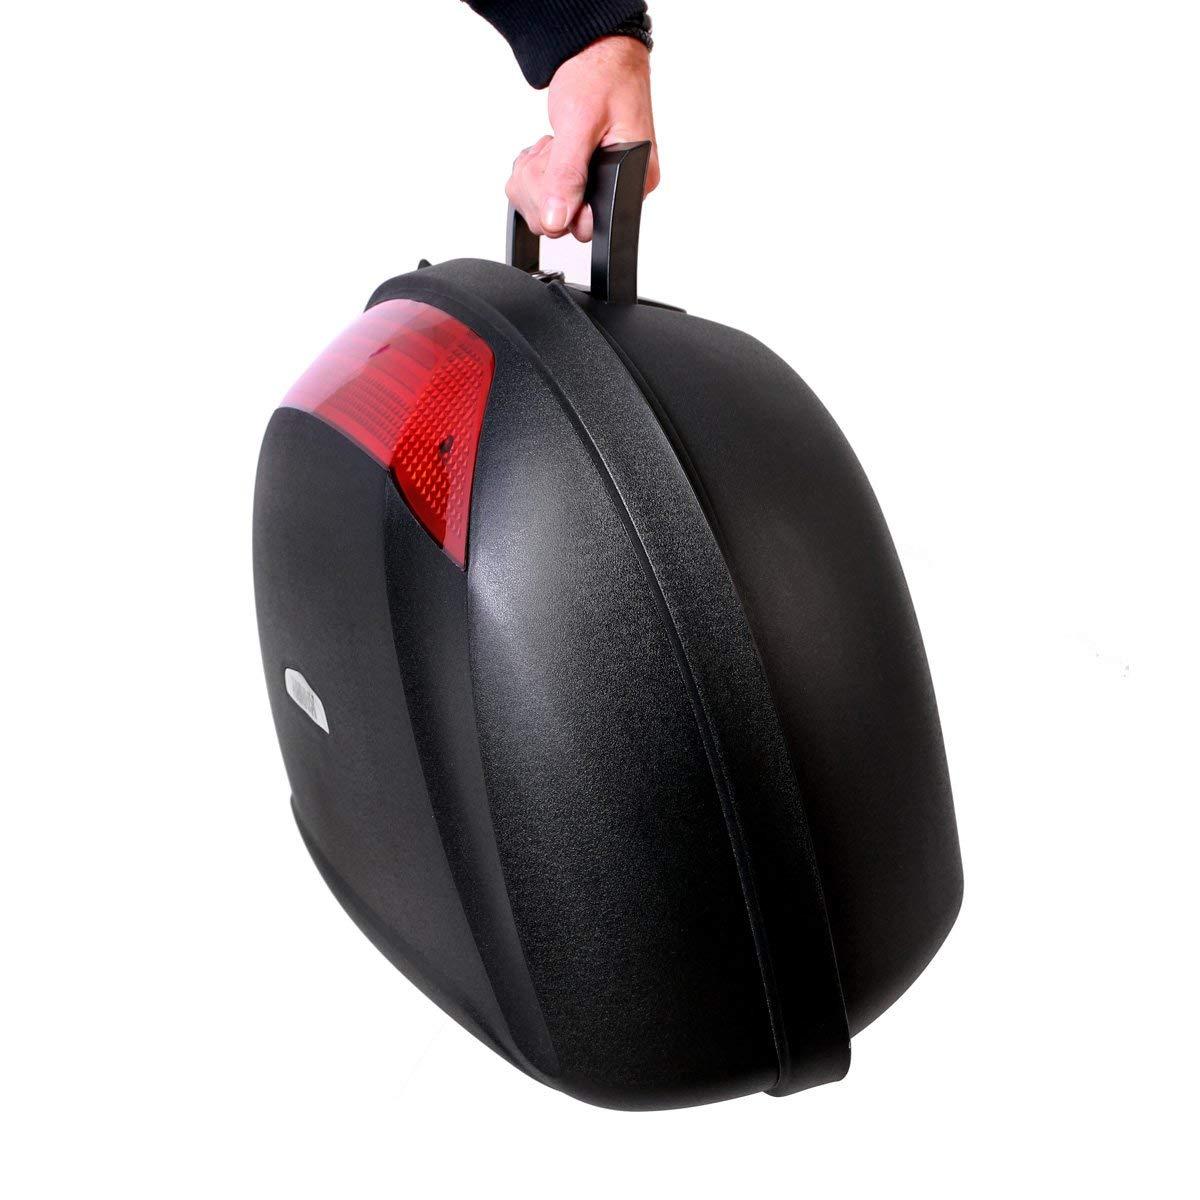 moto universel top case 52l 2 arri res casque valise arri re rangement moto ebay. Black Bedroom Furniture Sets. Home Design Ideas